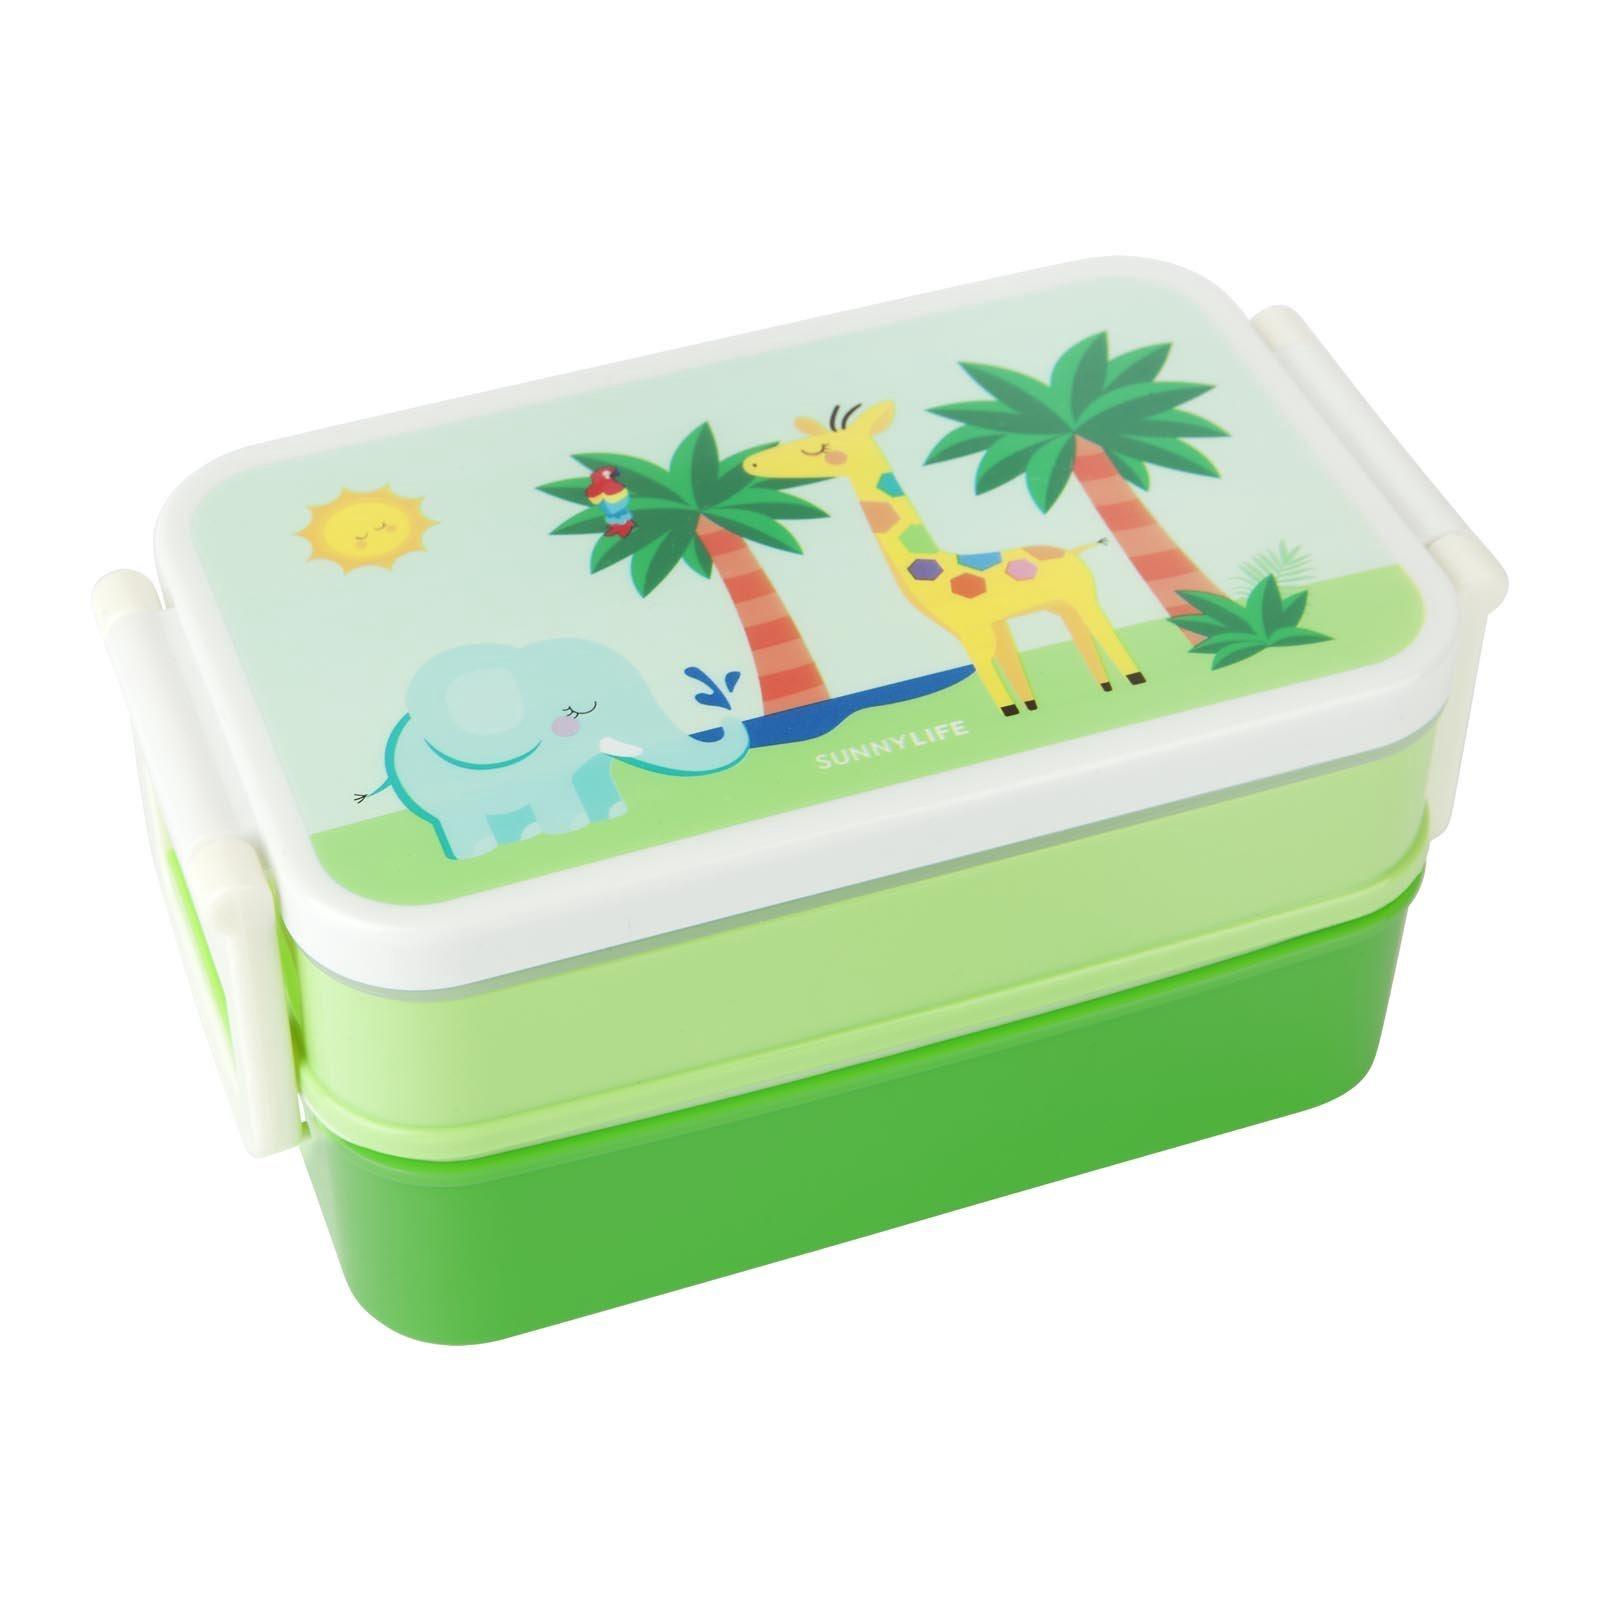 Sunny Life Kids Bento Box Safari